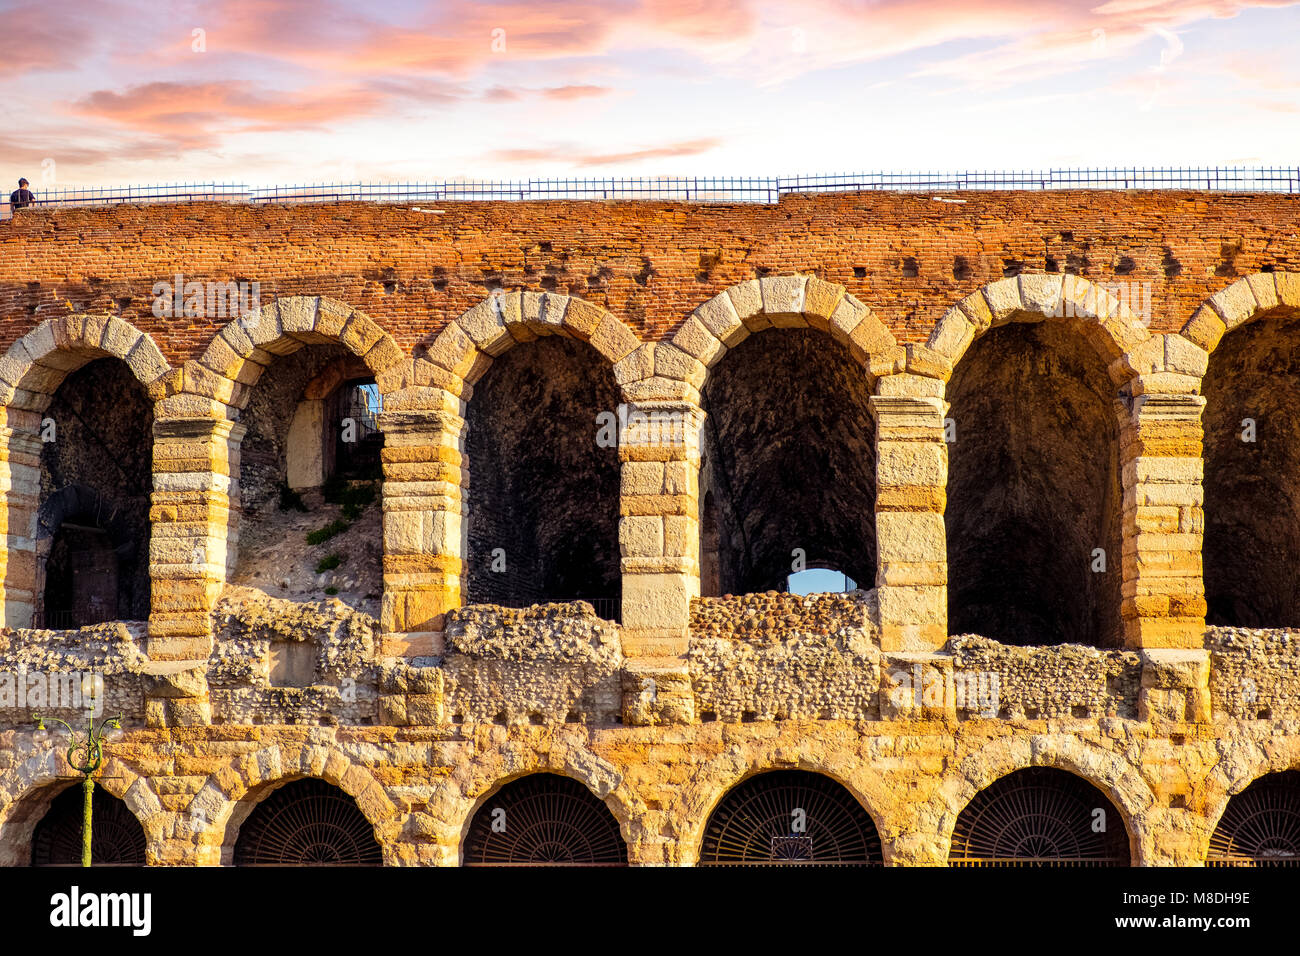 The beautiful roman amphitheater in the center of Verona, Italy Stock Photo